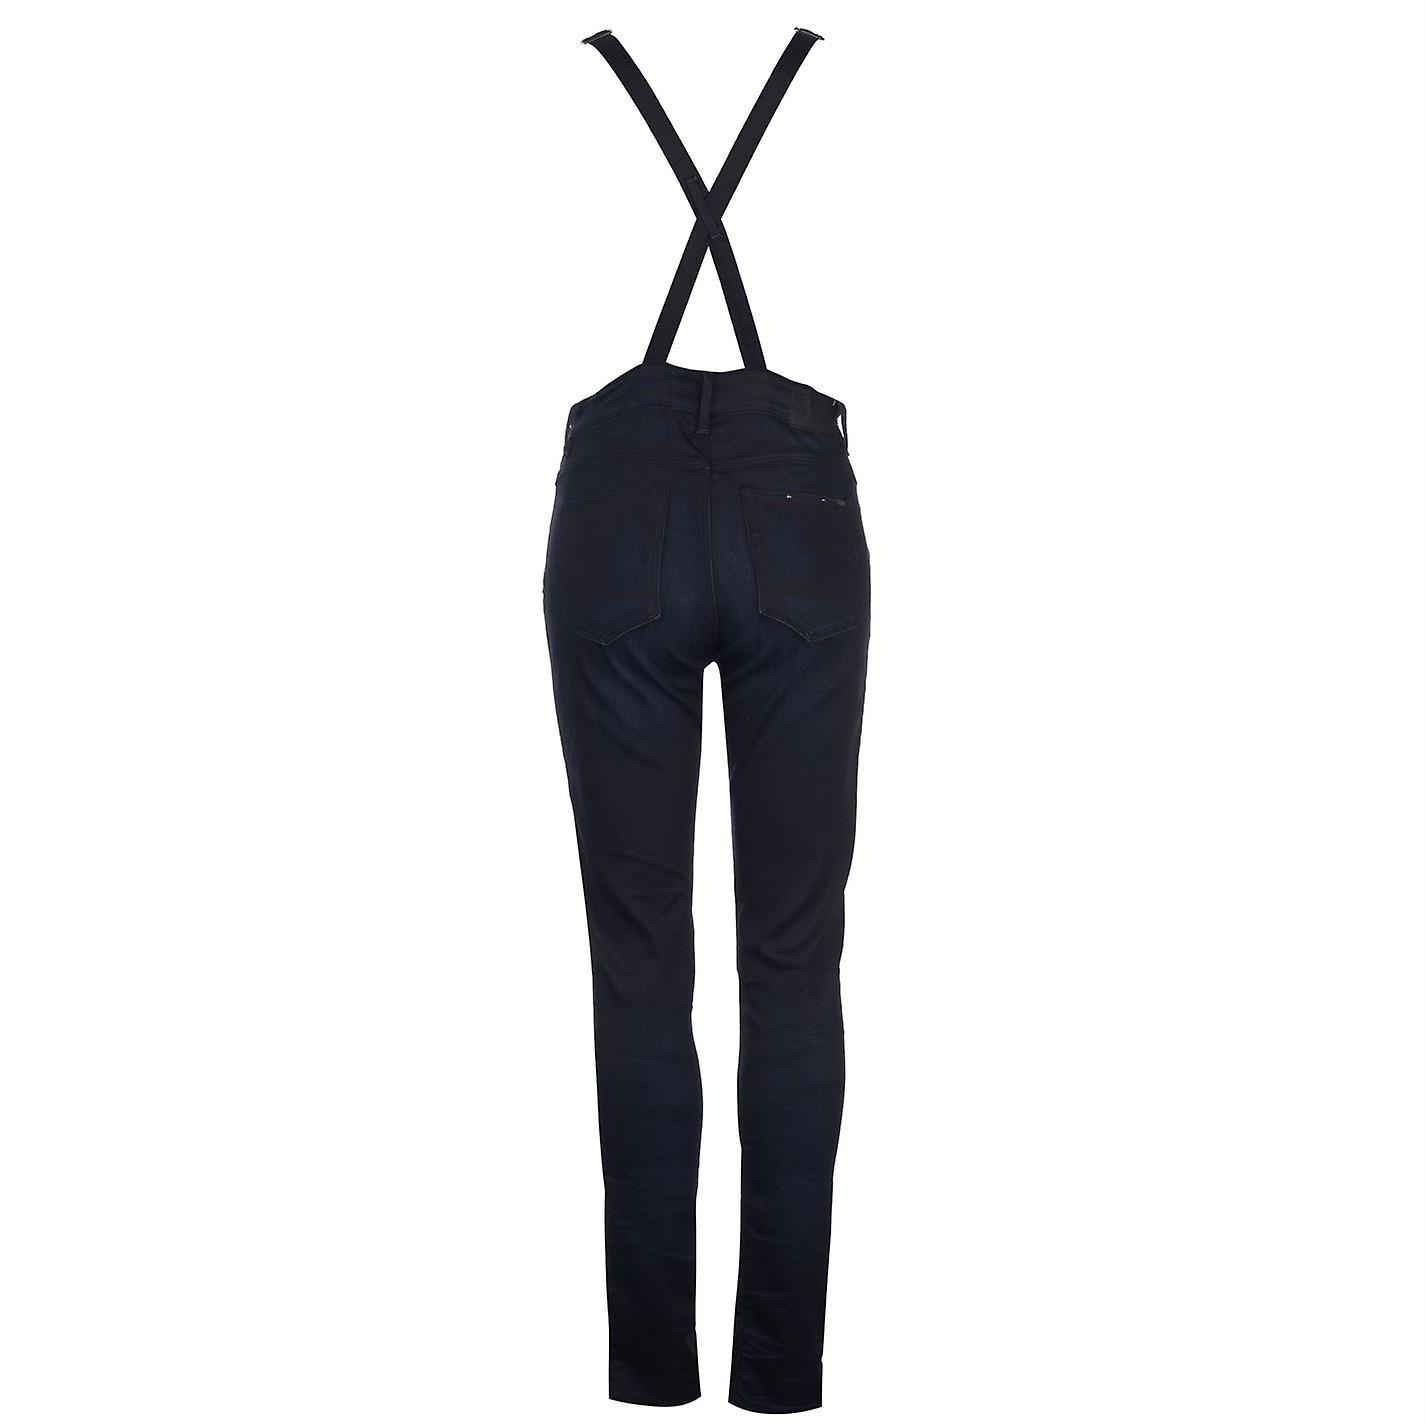 designer fashion f630e 742f2 G Star Womens Raw 3301 Overalls Jumpsuit Zip Denim